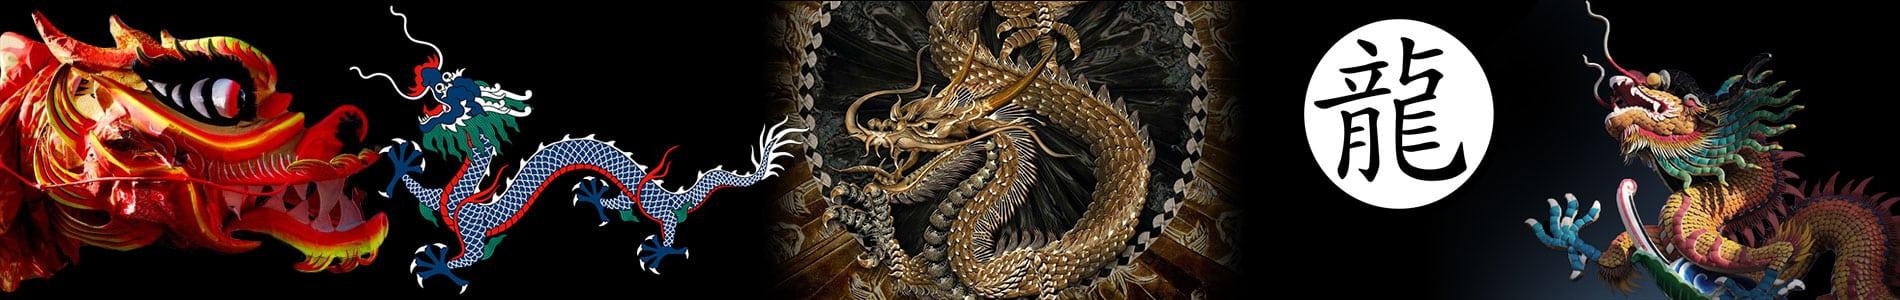 Oosterse draken tattoo banner